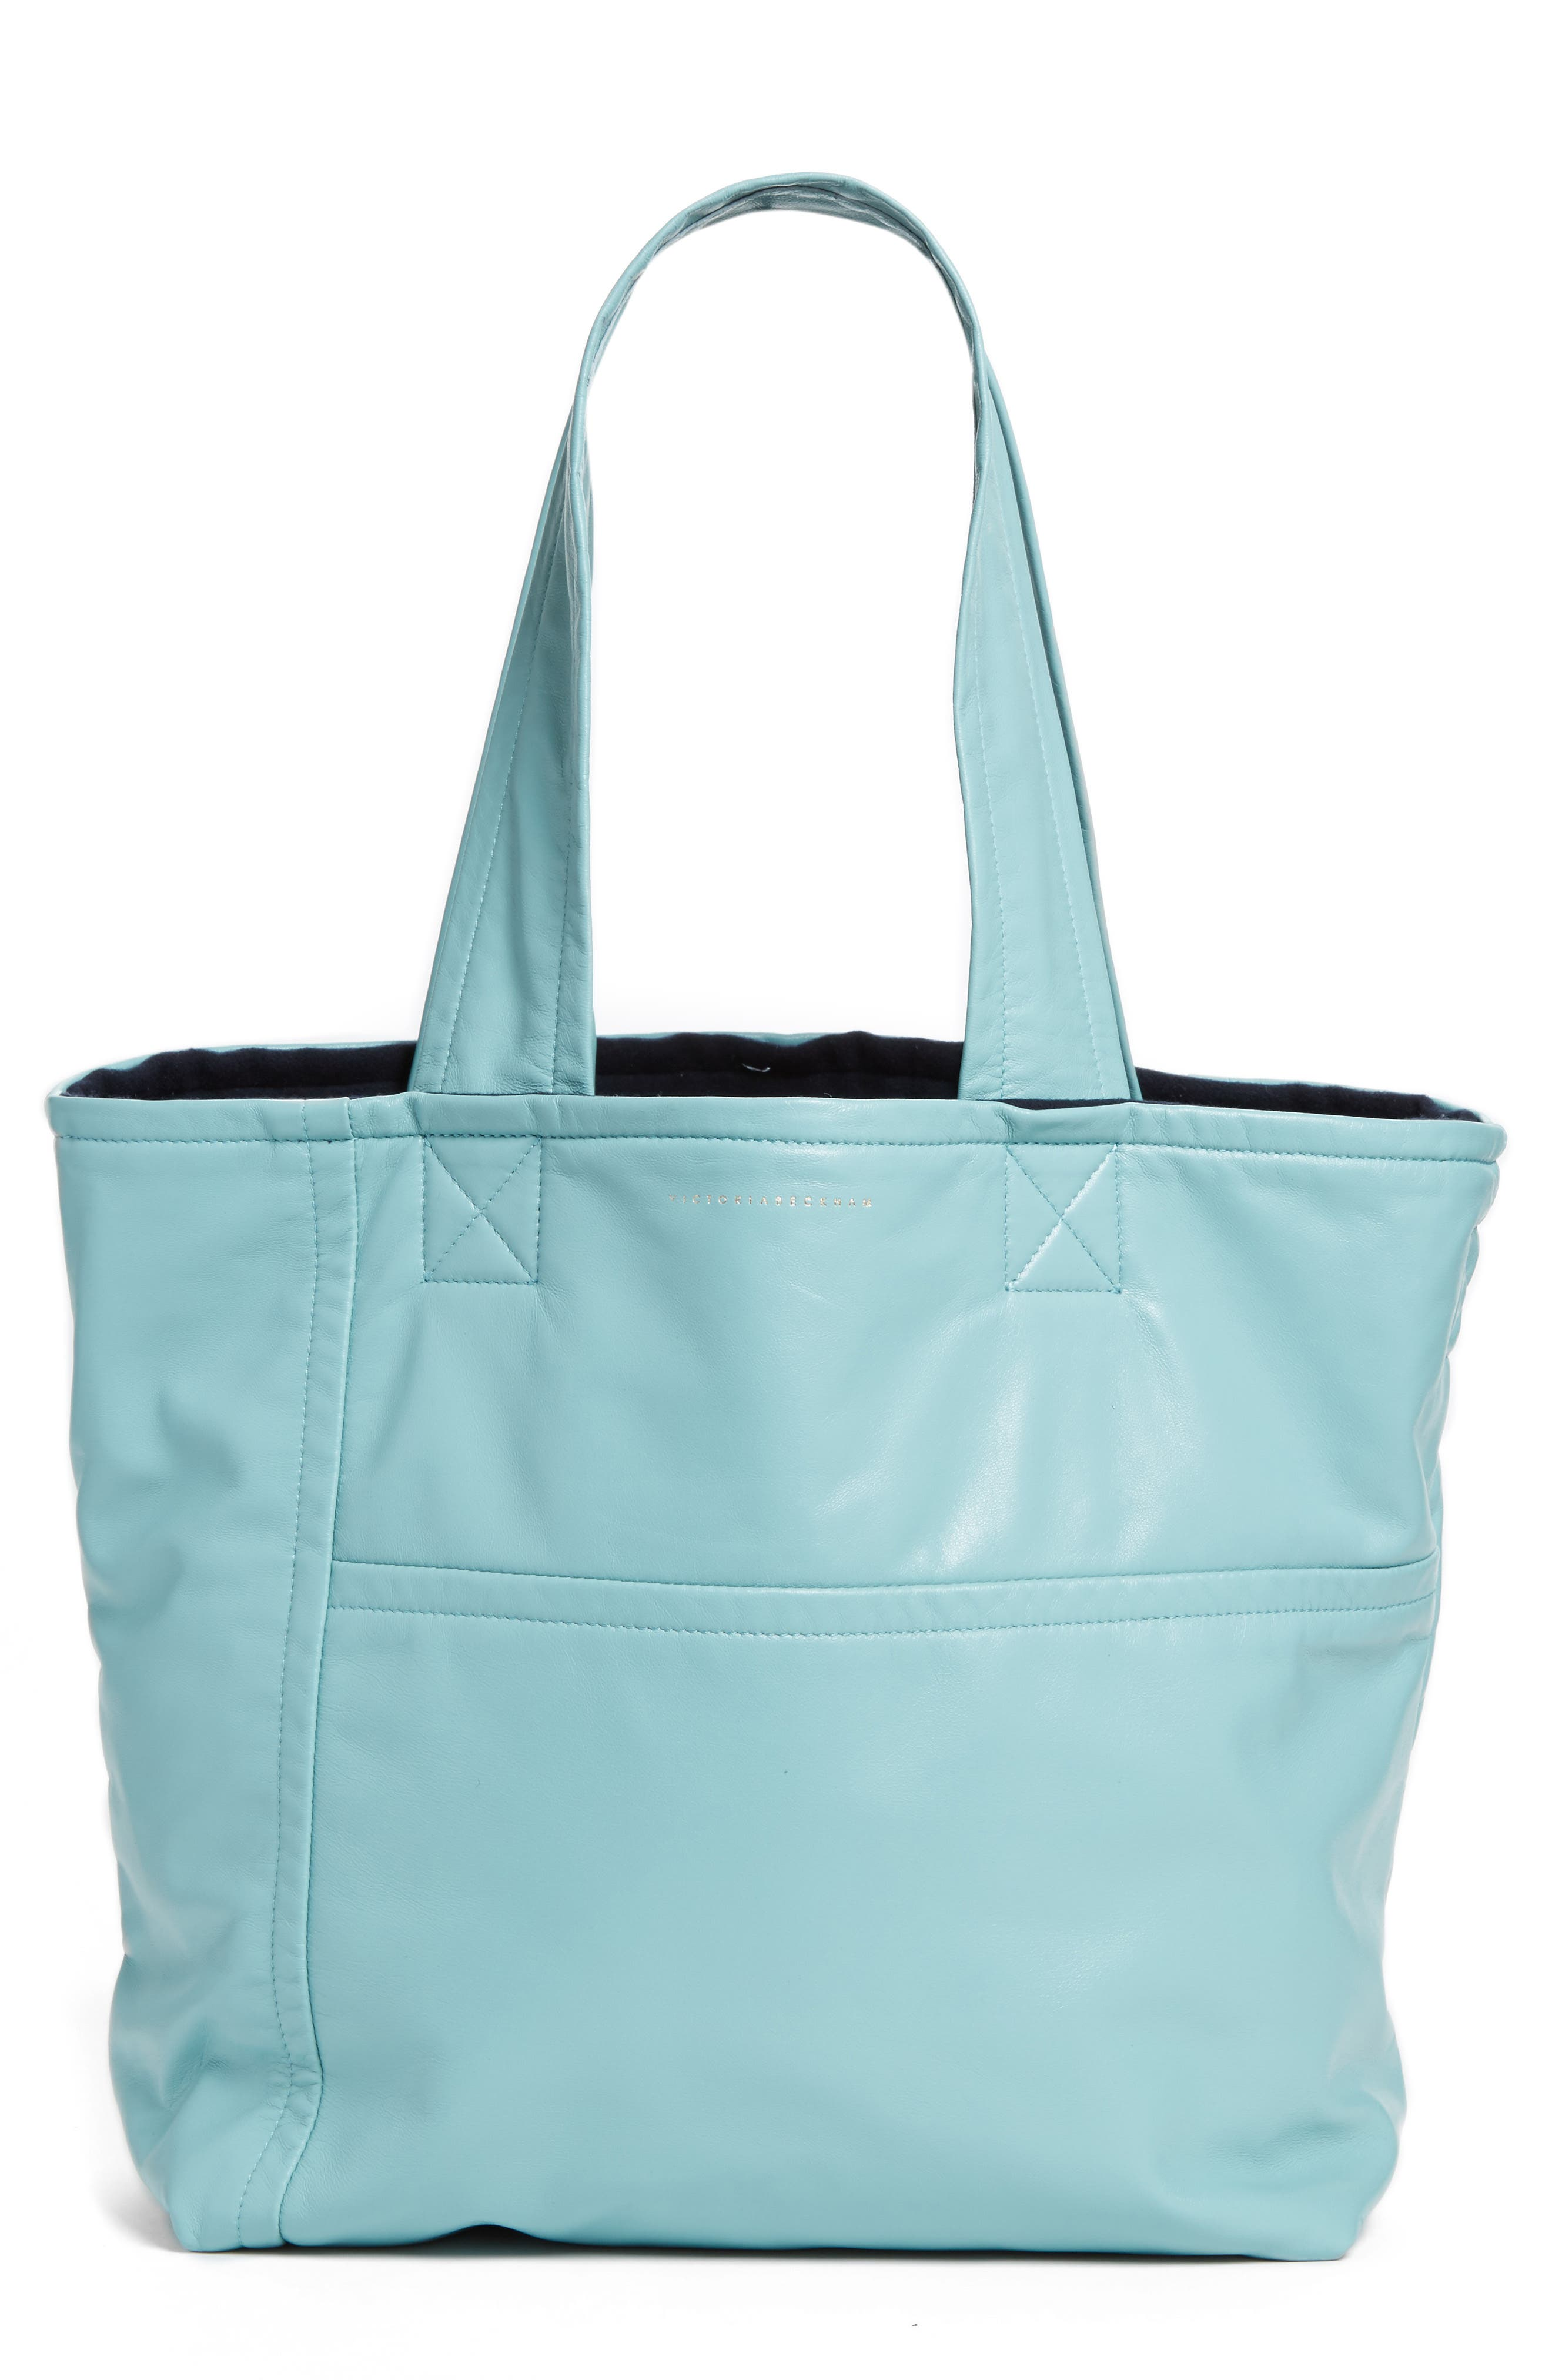 Alternate Image 1 Selected - Victoria Beckham Sunday Bag